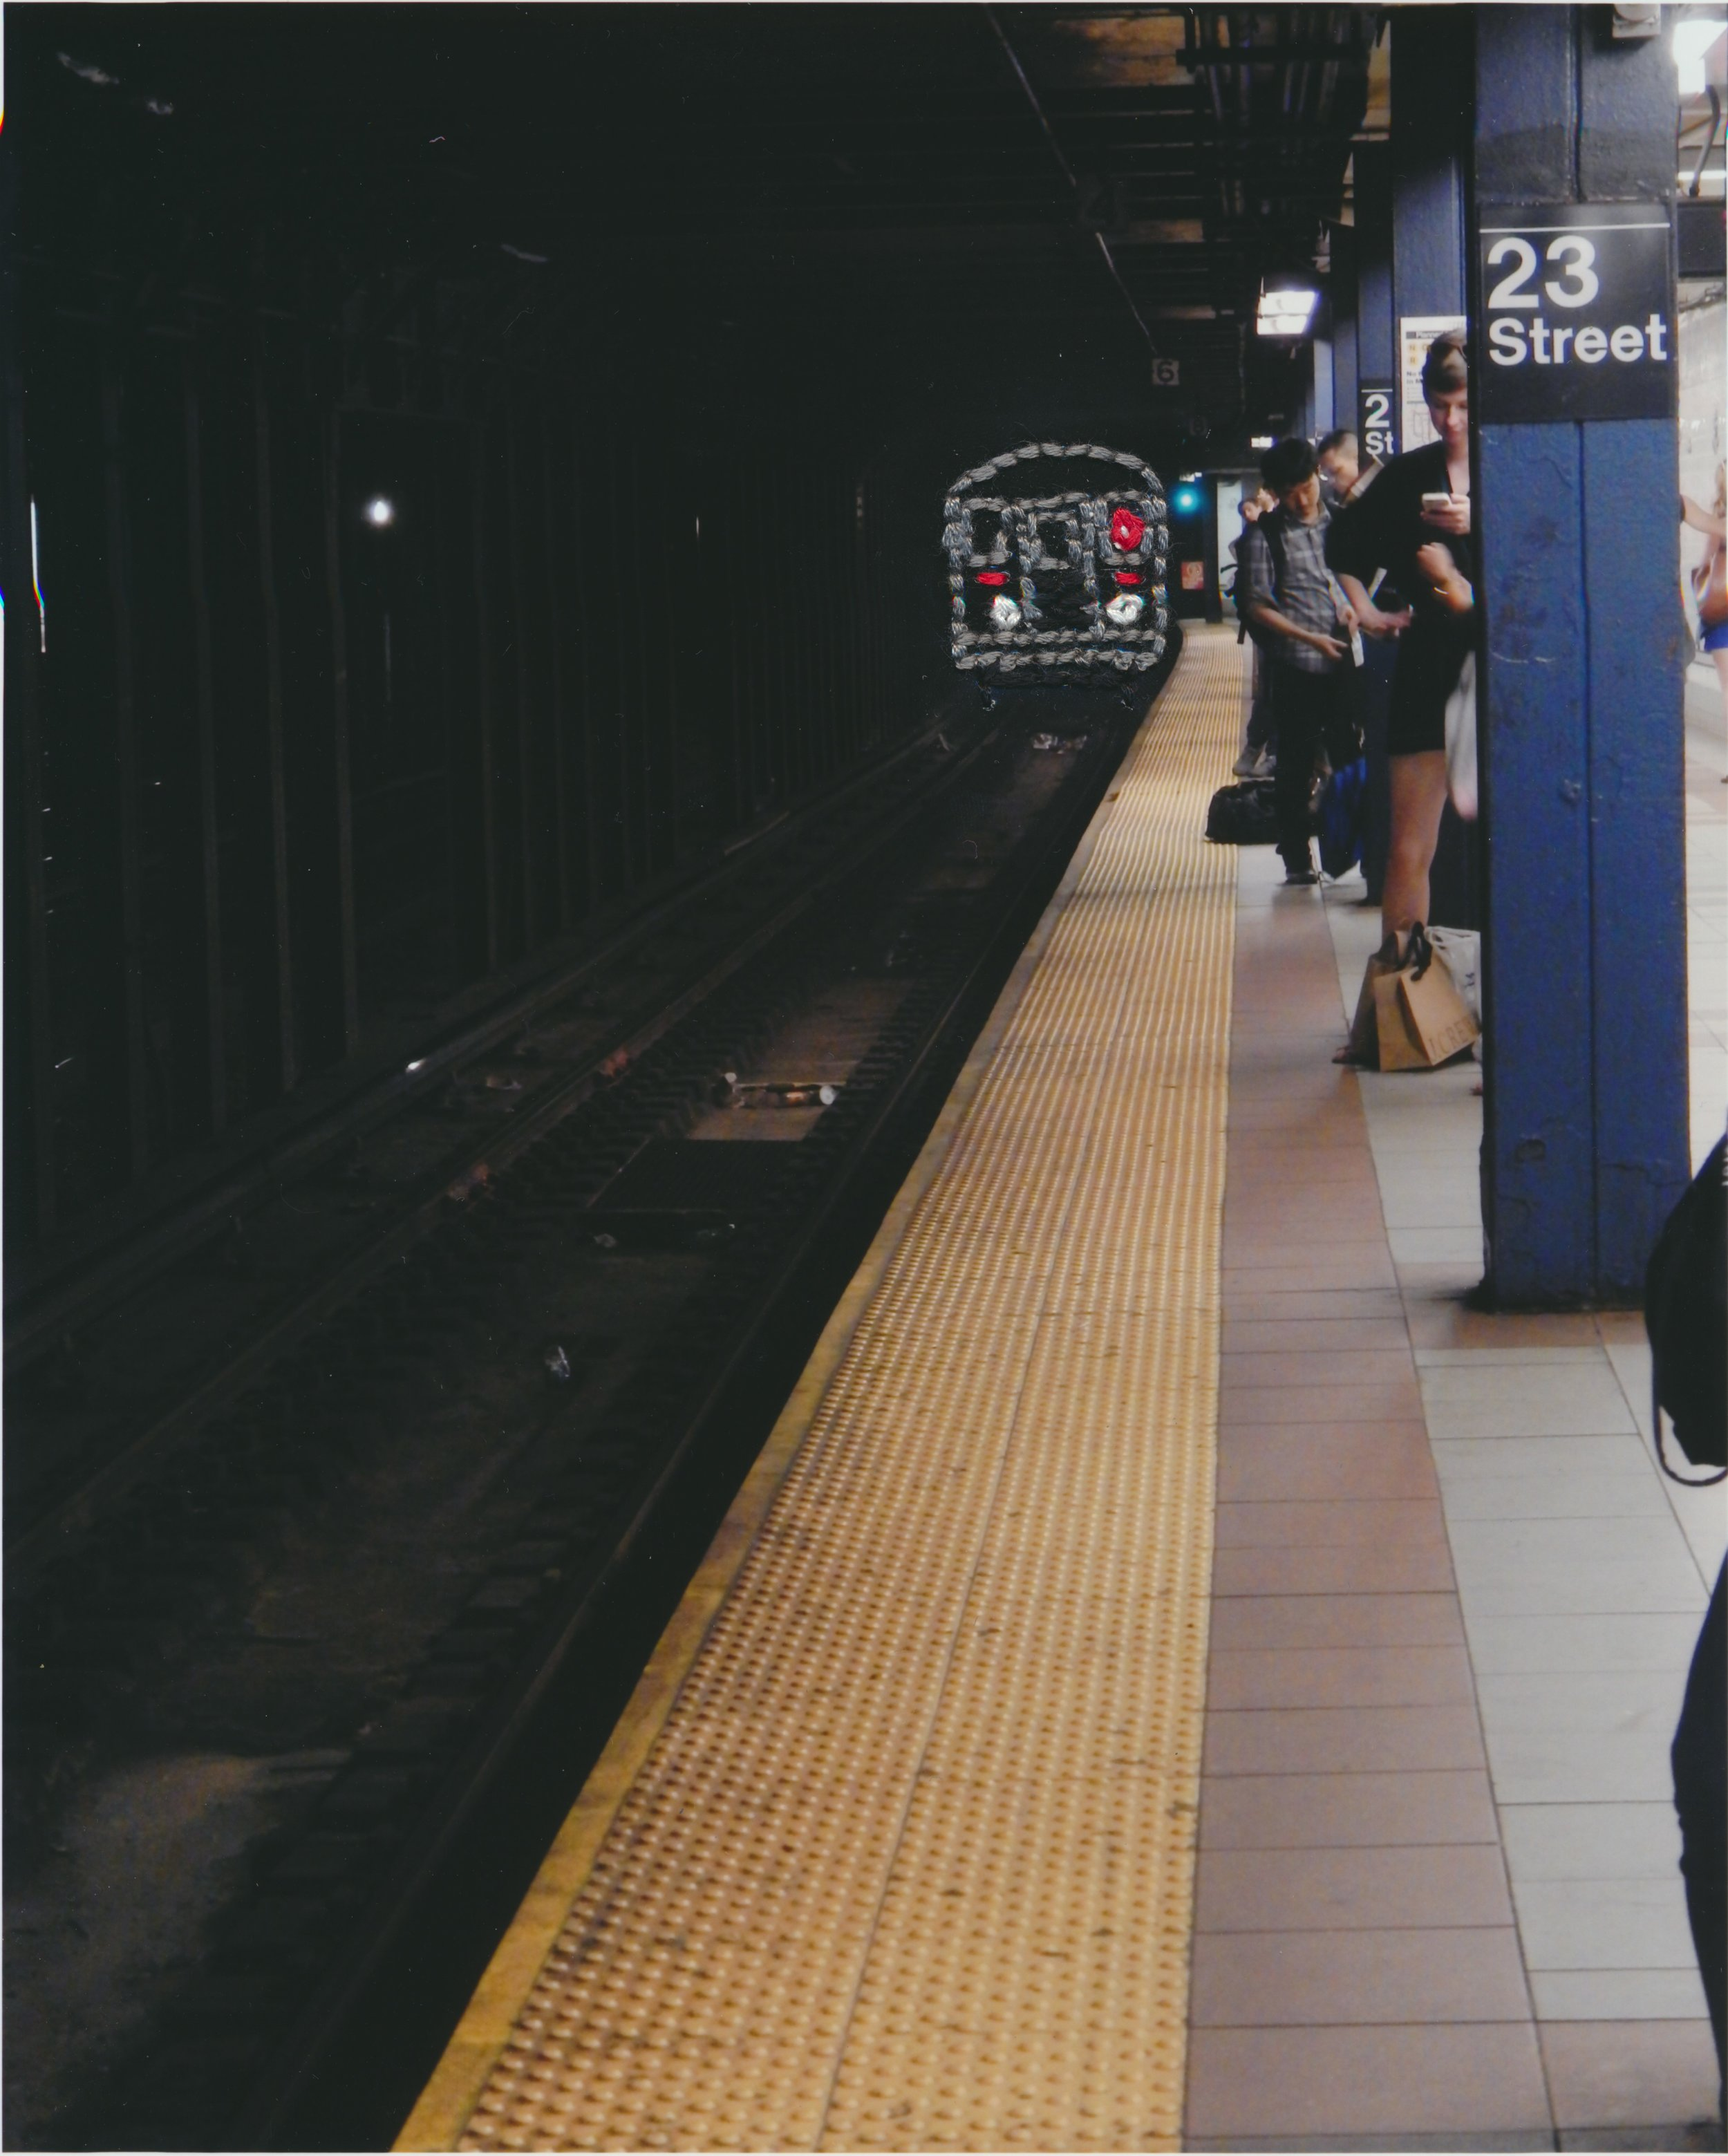 23rd street subway